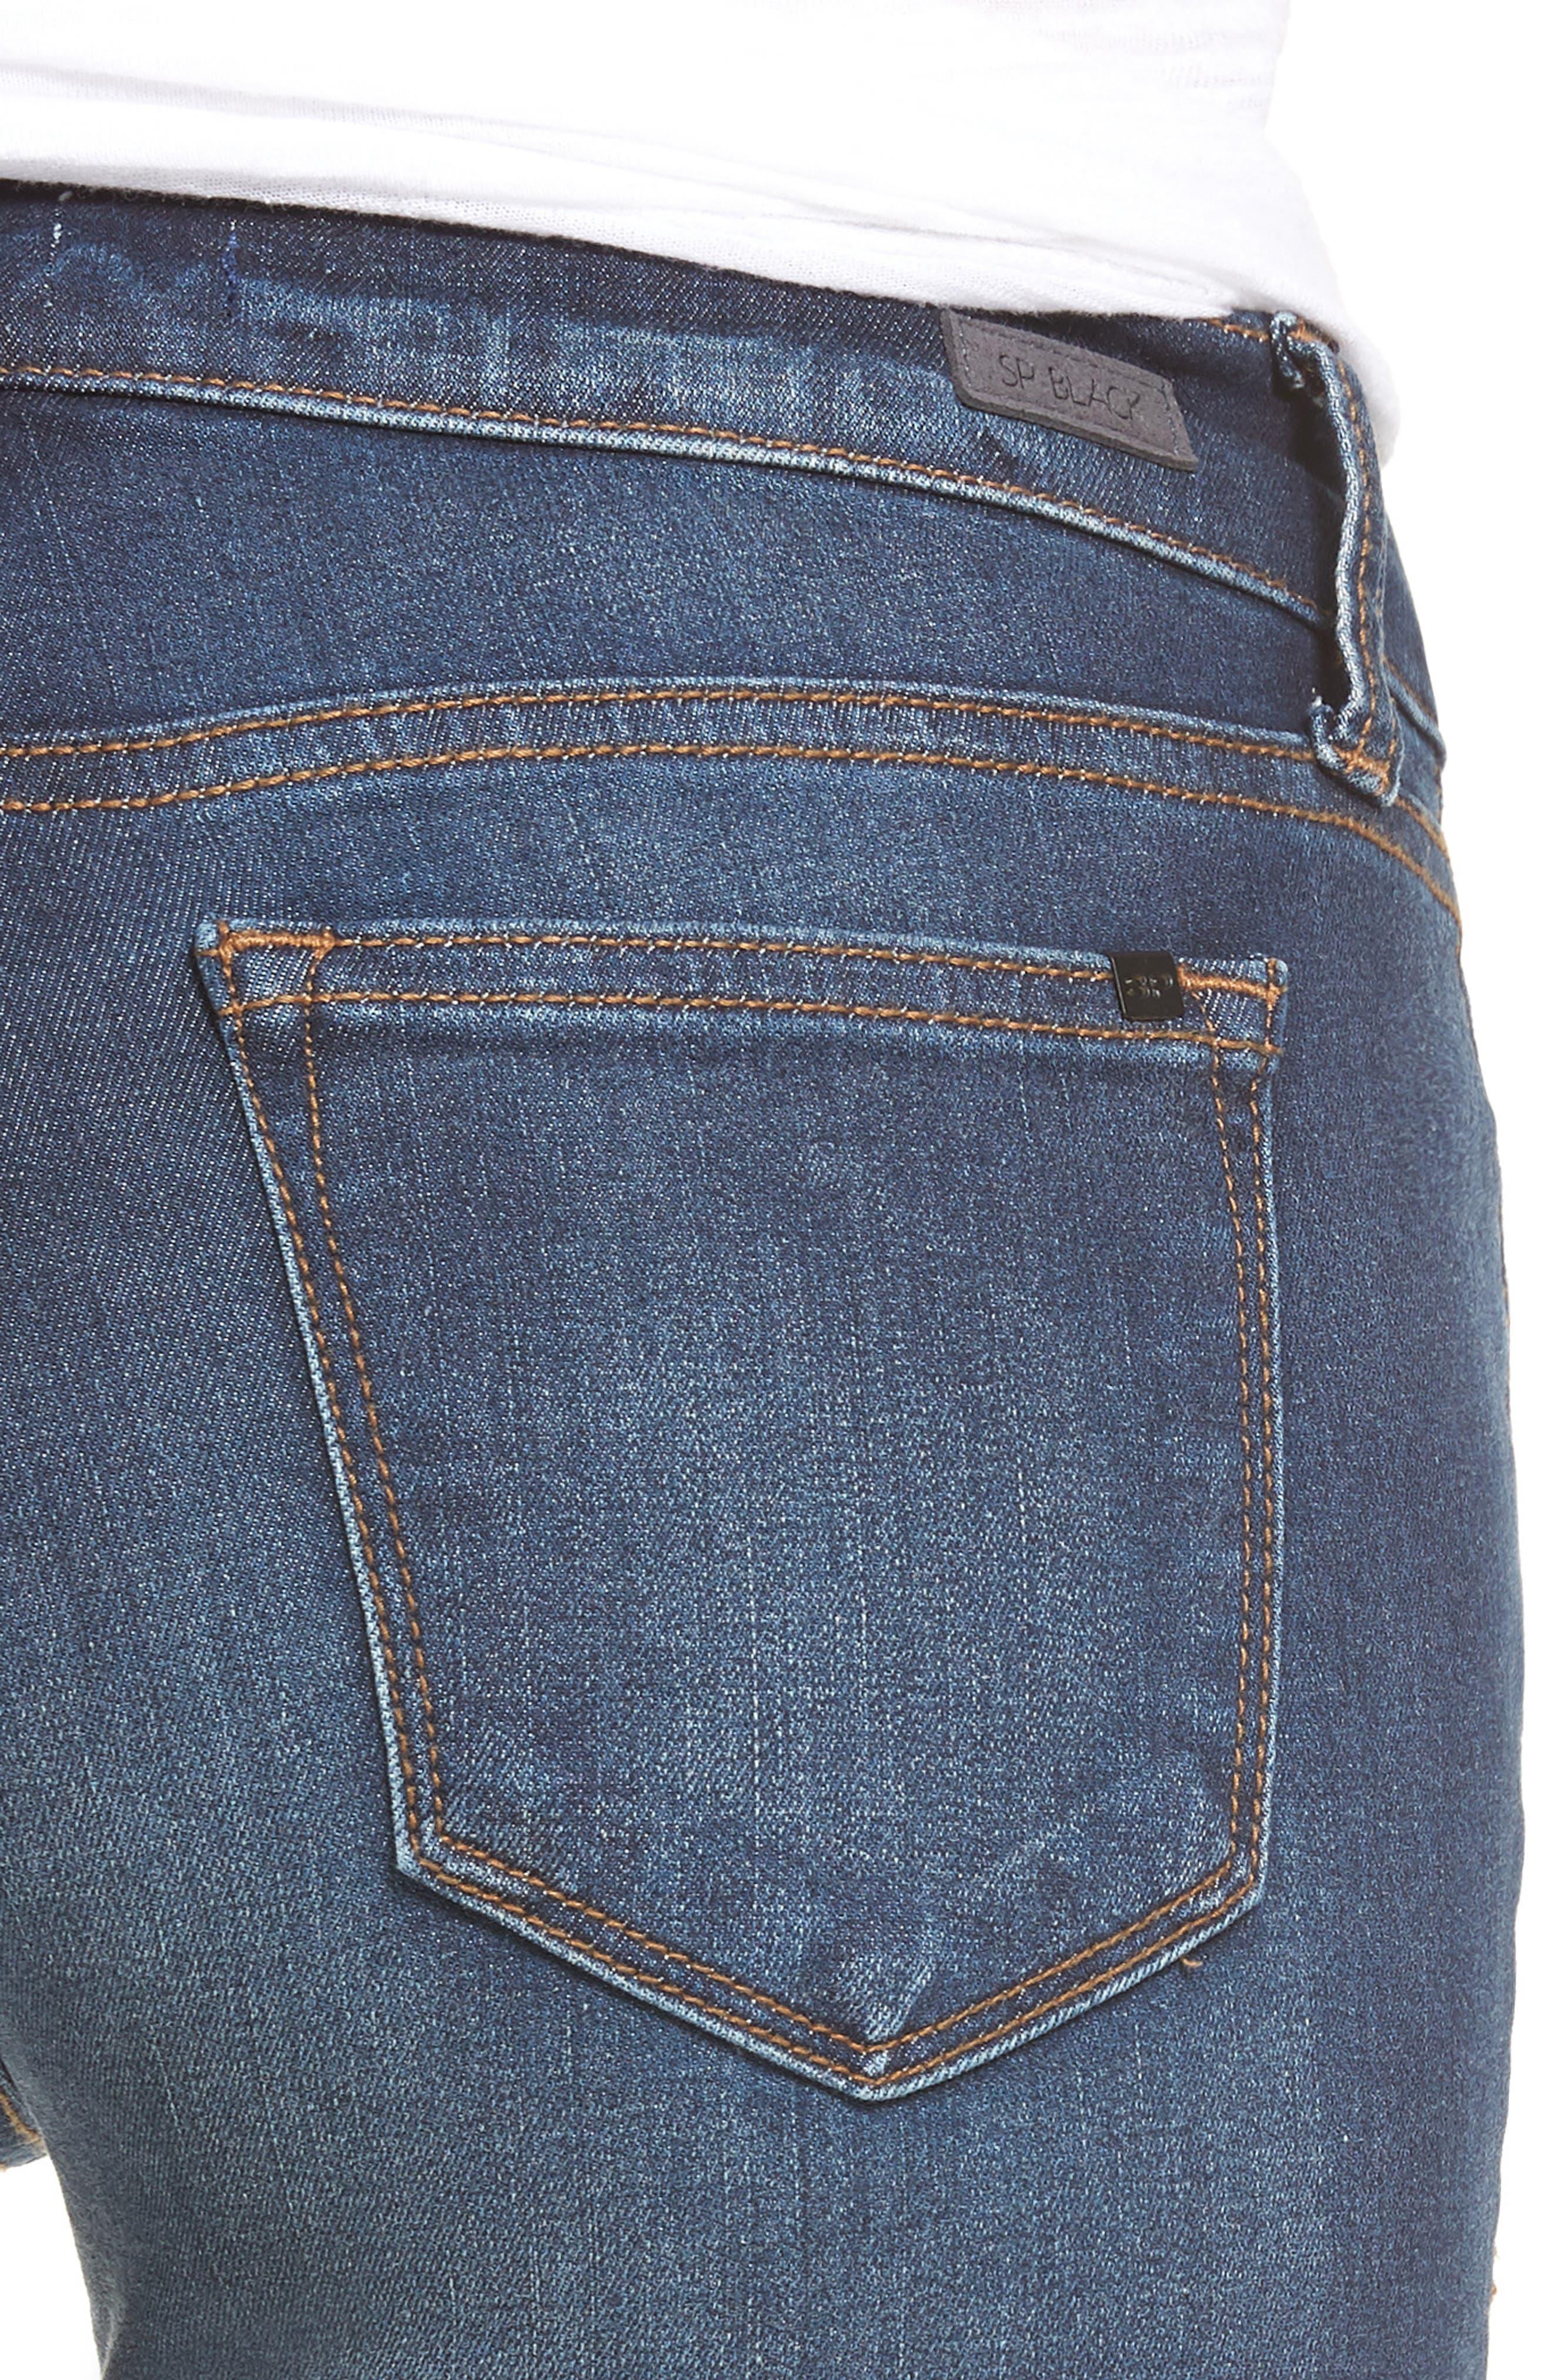 Roll Cuff Skinny Jeans,                             Alternate thumbnail 4, color,                             Dark Wash